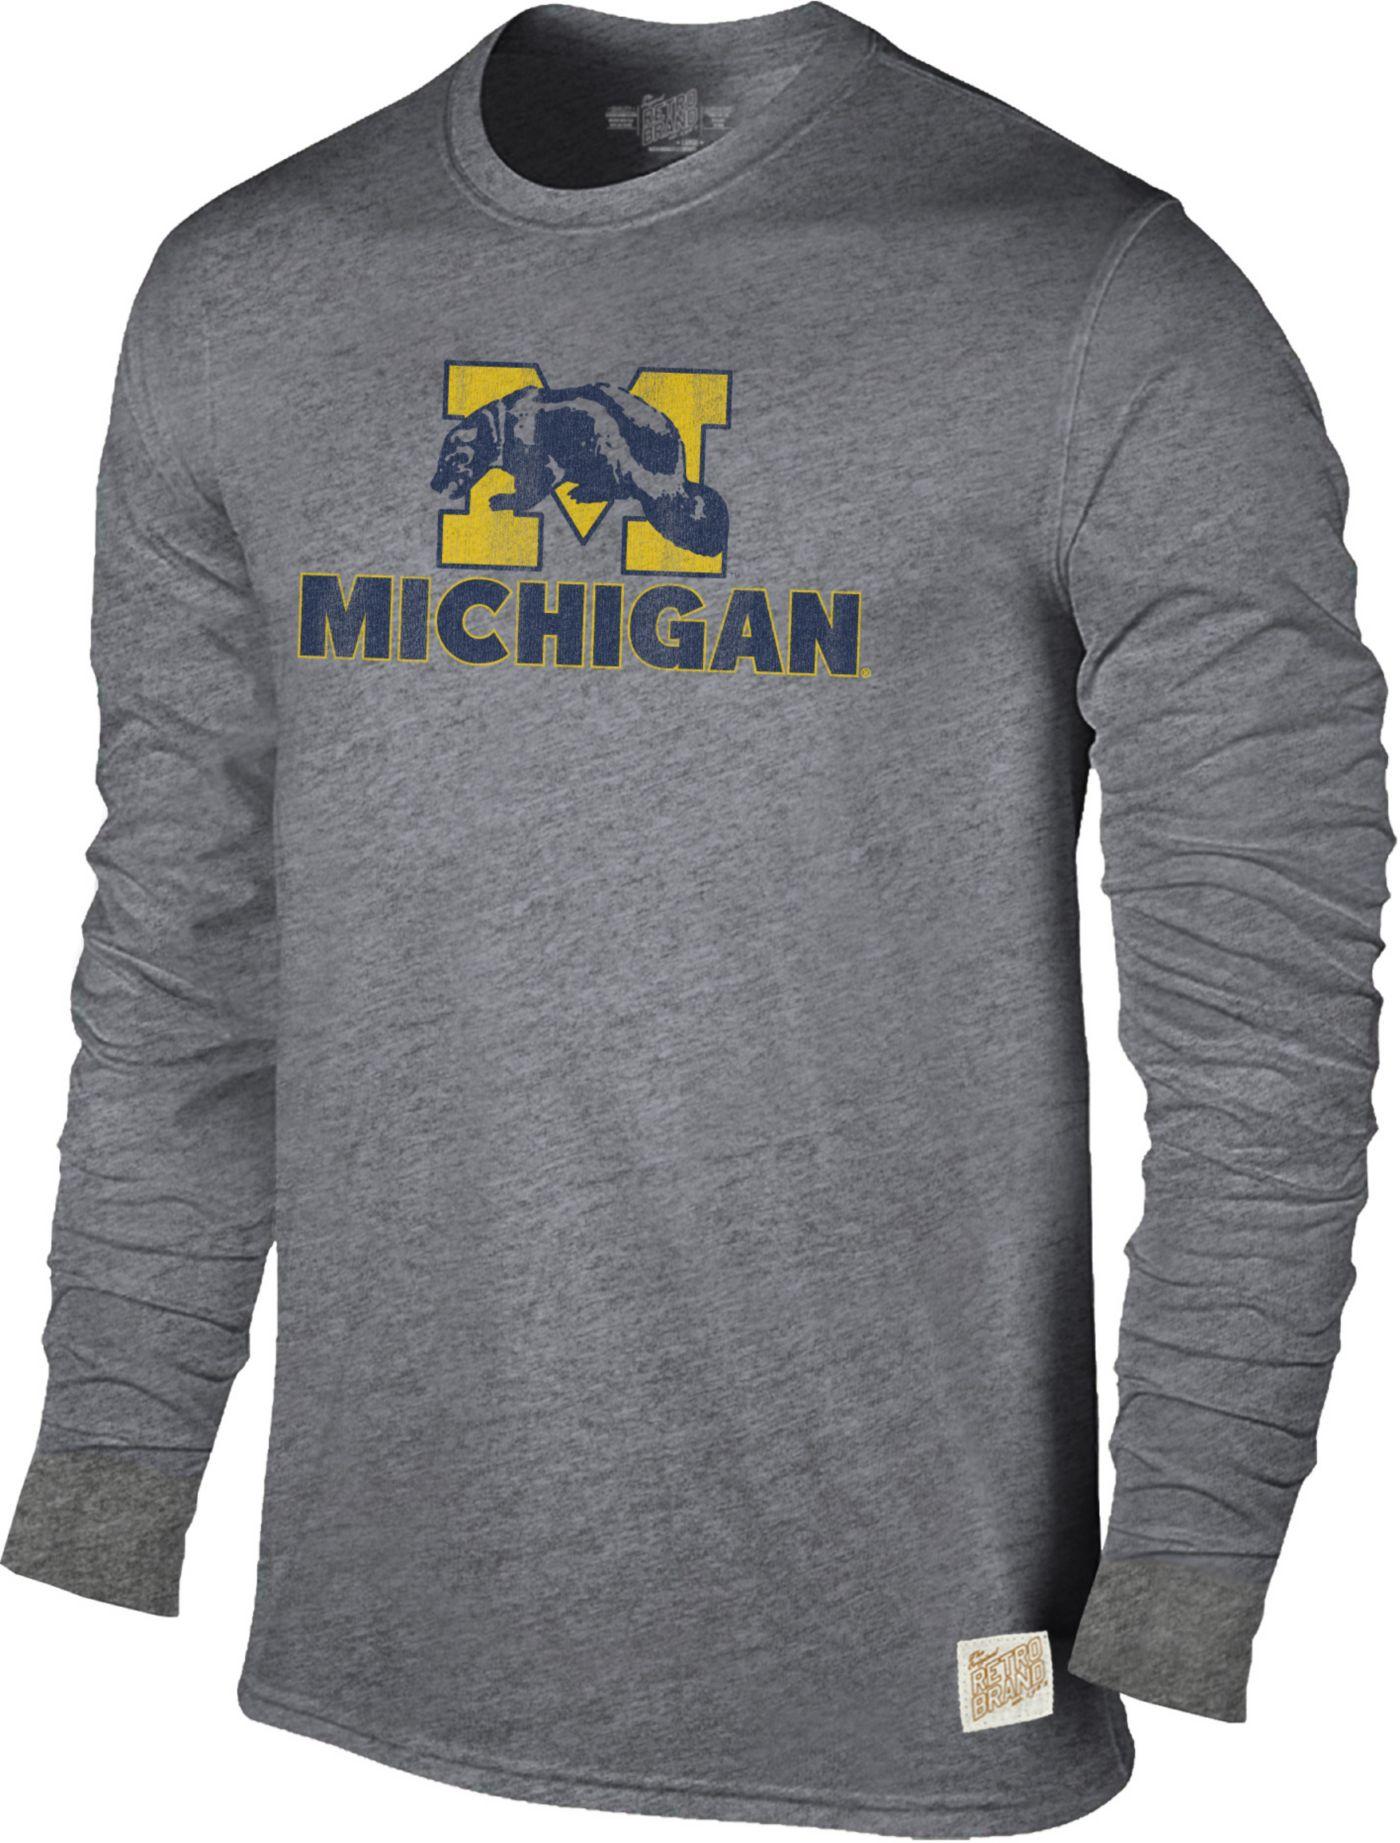 Original Retro Brand Men's Michigan Wolverines Grey Tri-Blend Long Sleeve T-Shirt